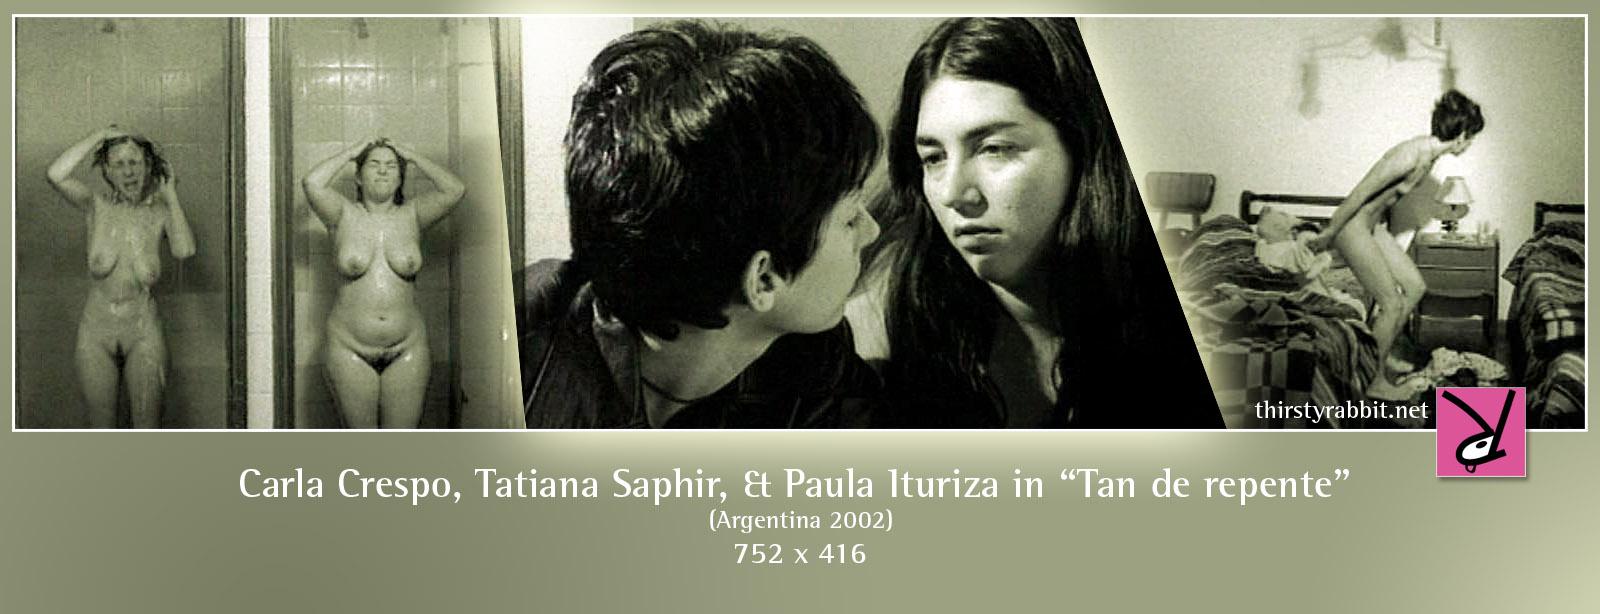 Tatiana Saphir, Carla Crespo, and Paula Ituriza nude in Tan de repente aka Suddenly